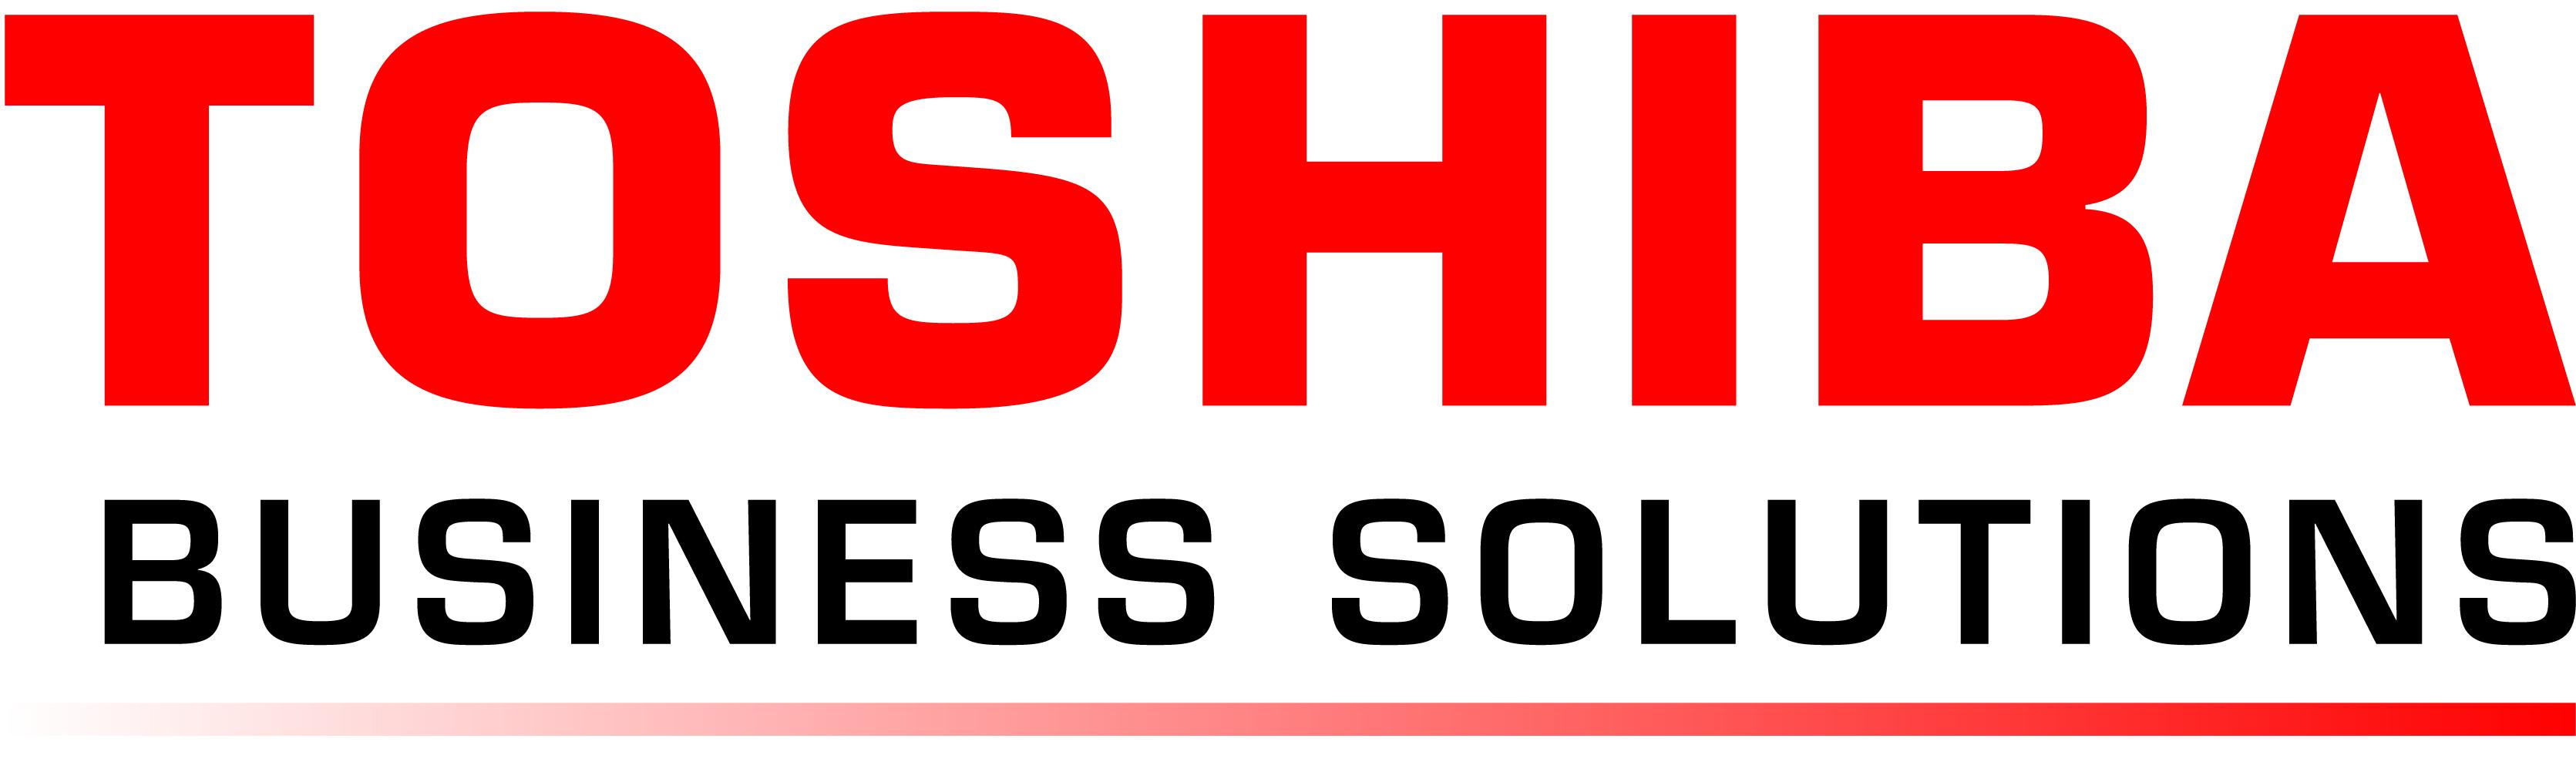 Toshiba-logo-big